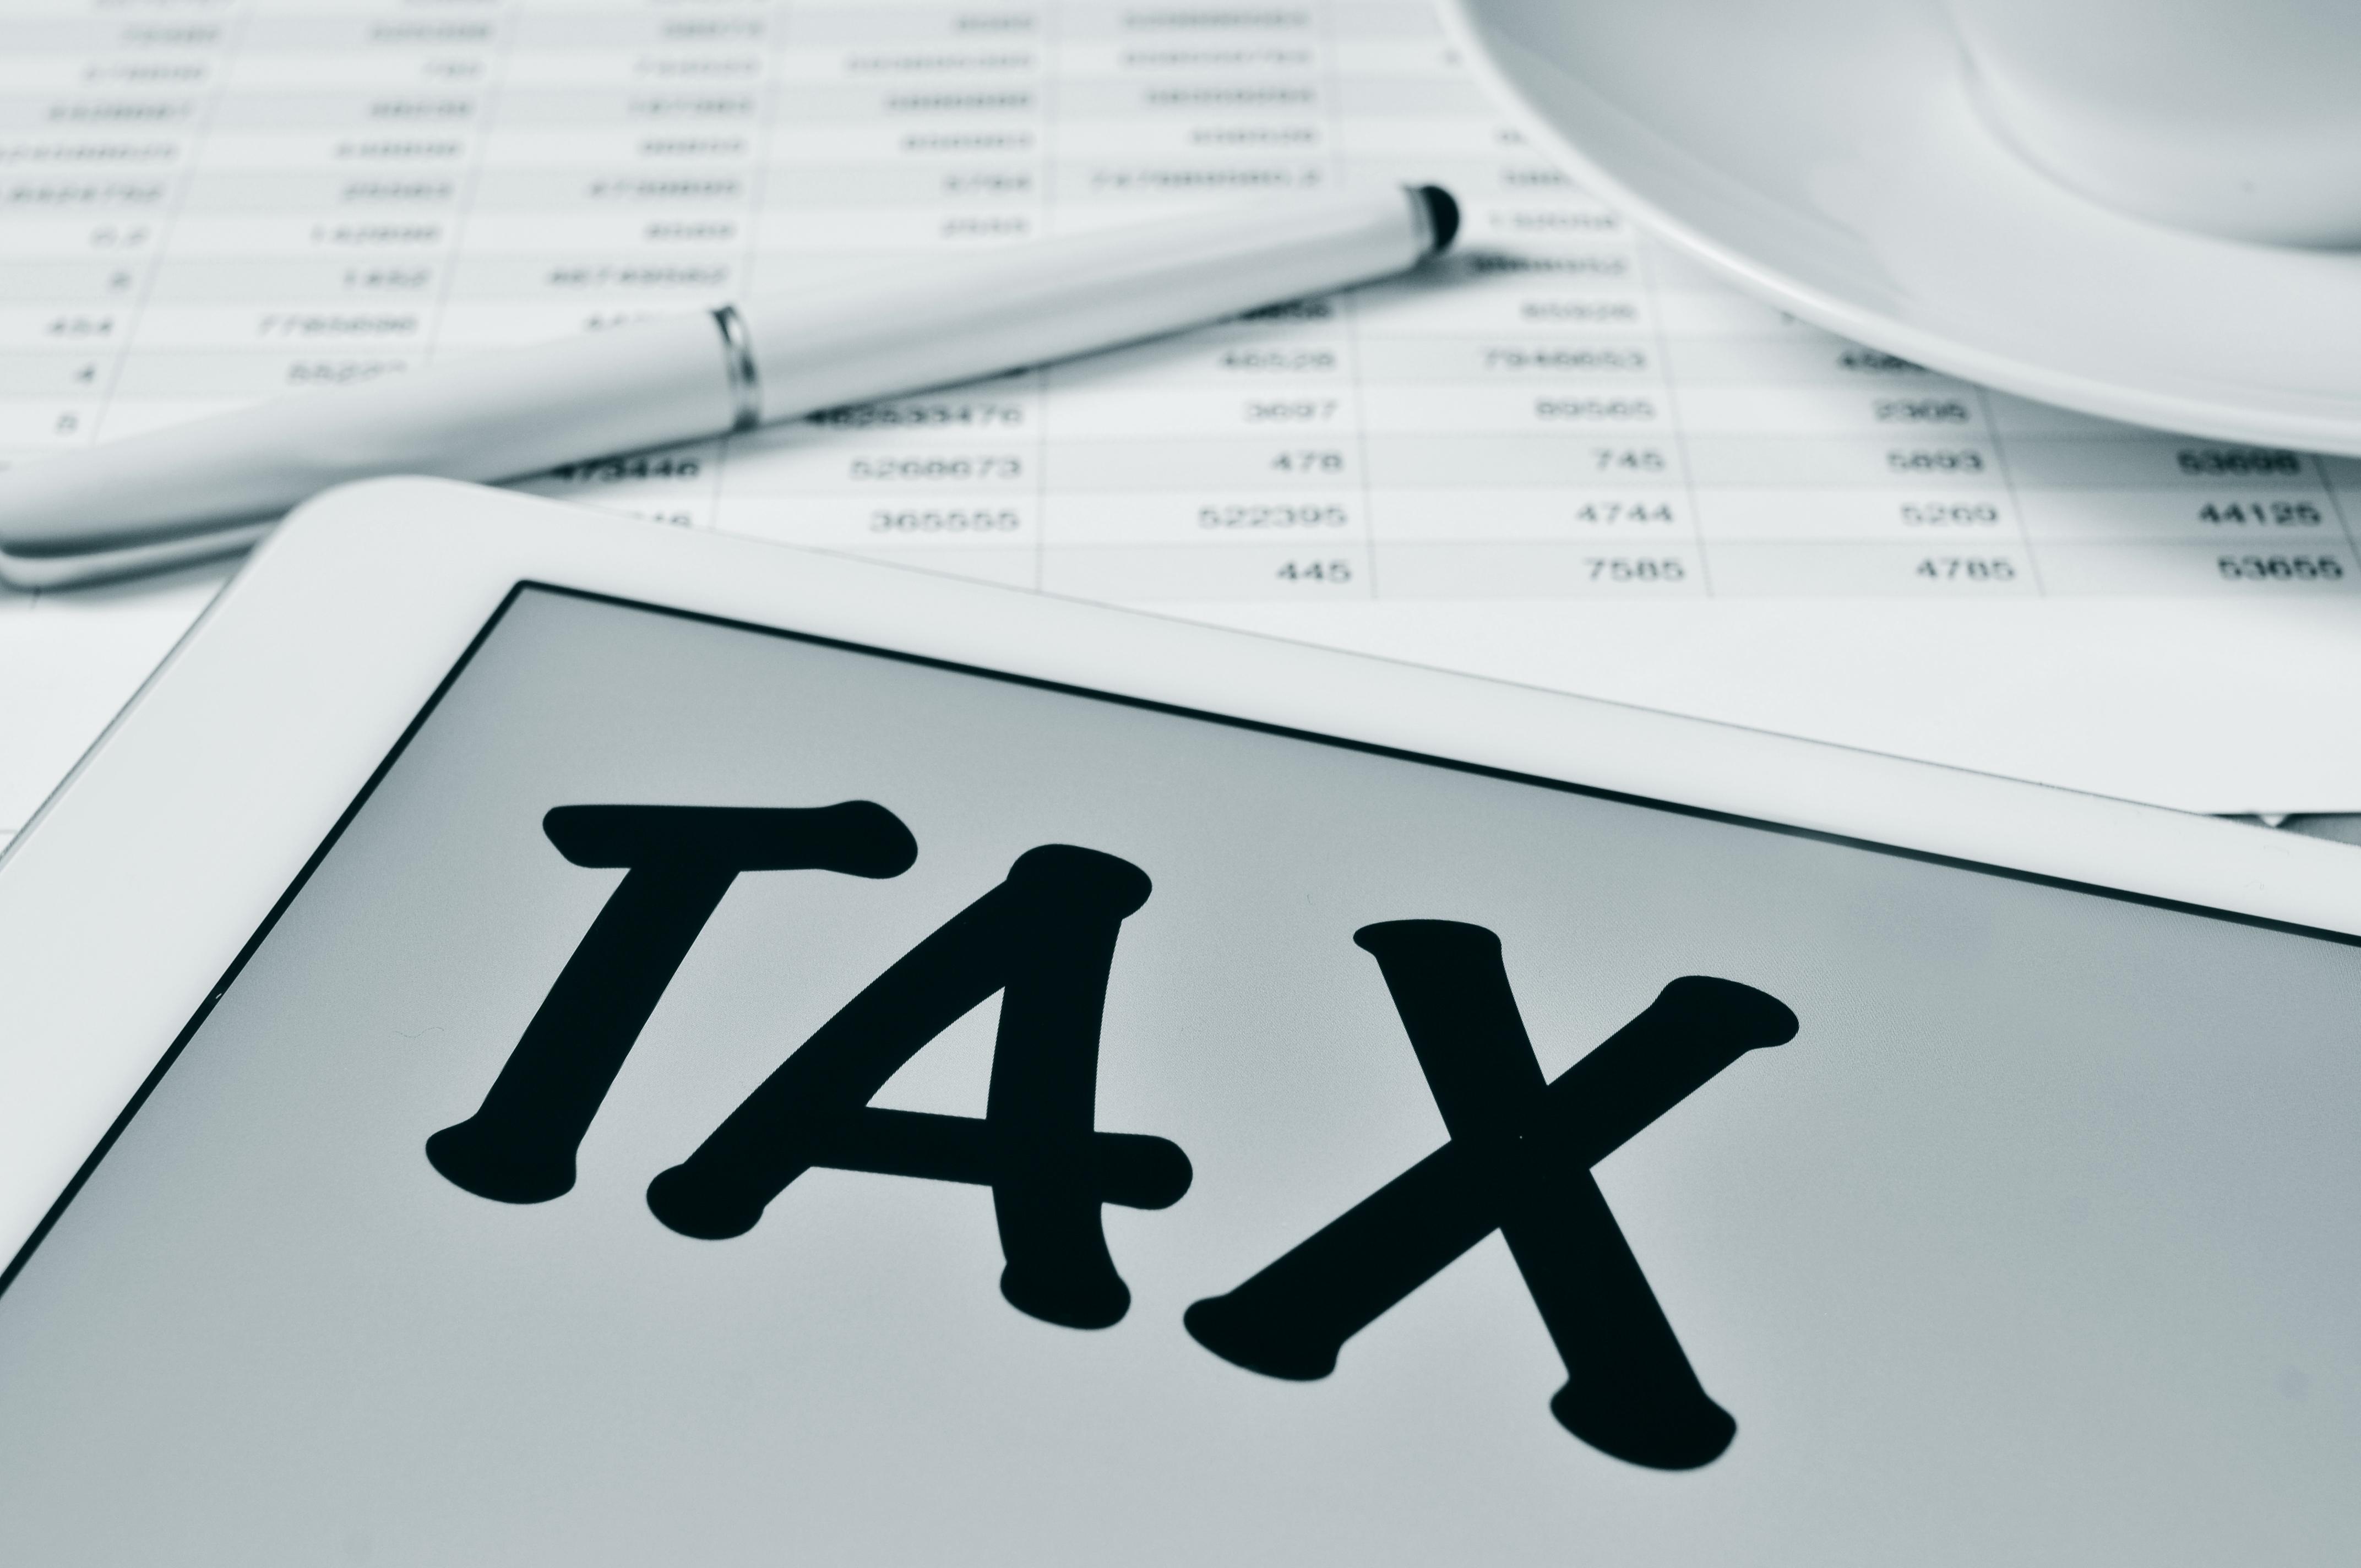 H ενιαία φορολόγηση σημαίνει έμμεσo περιορισμό του transfer pricing